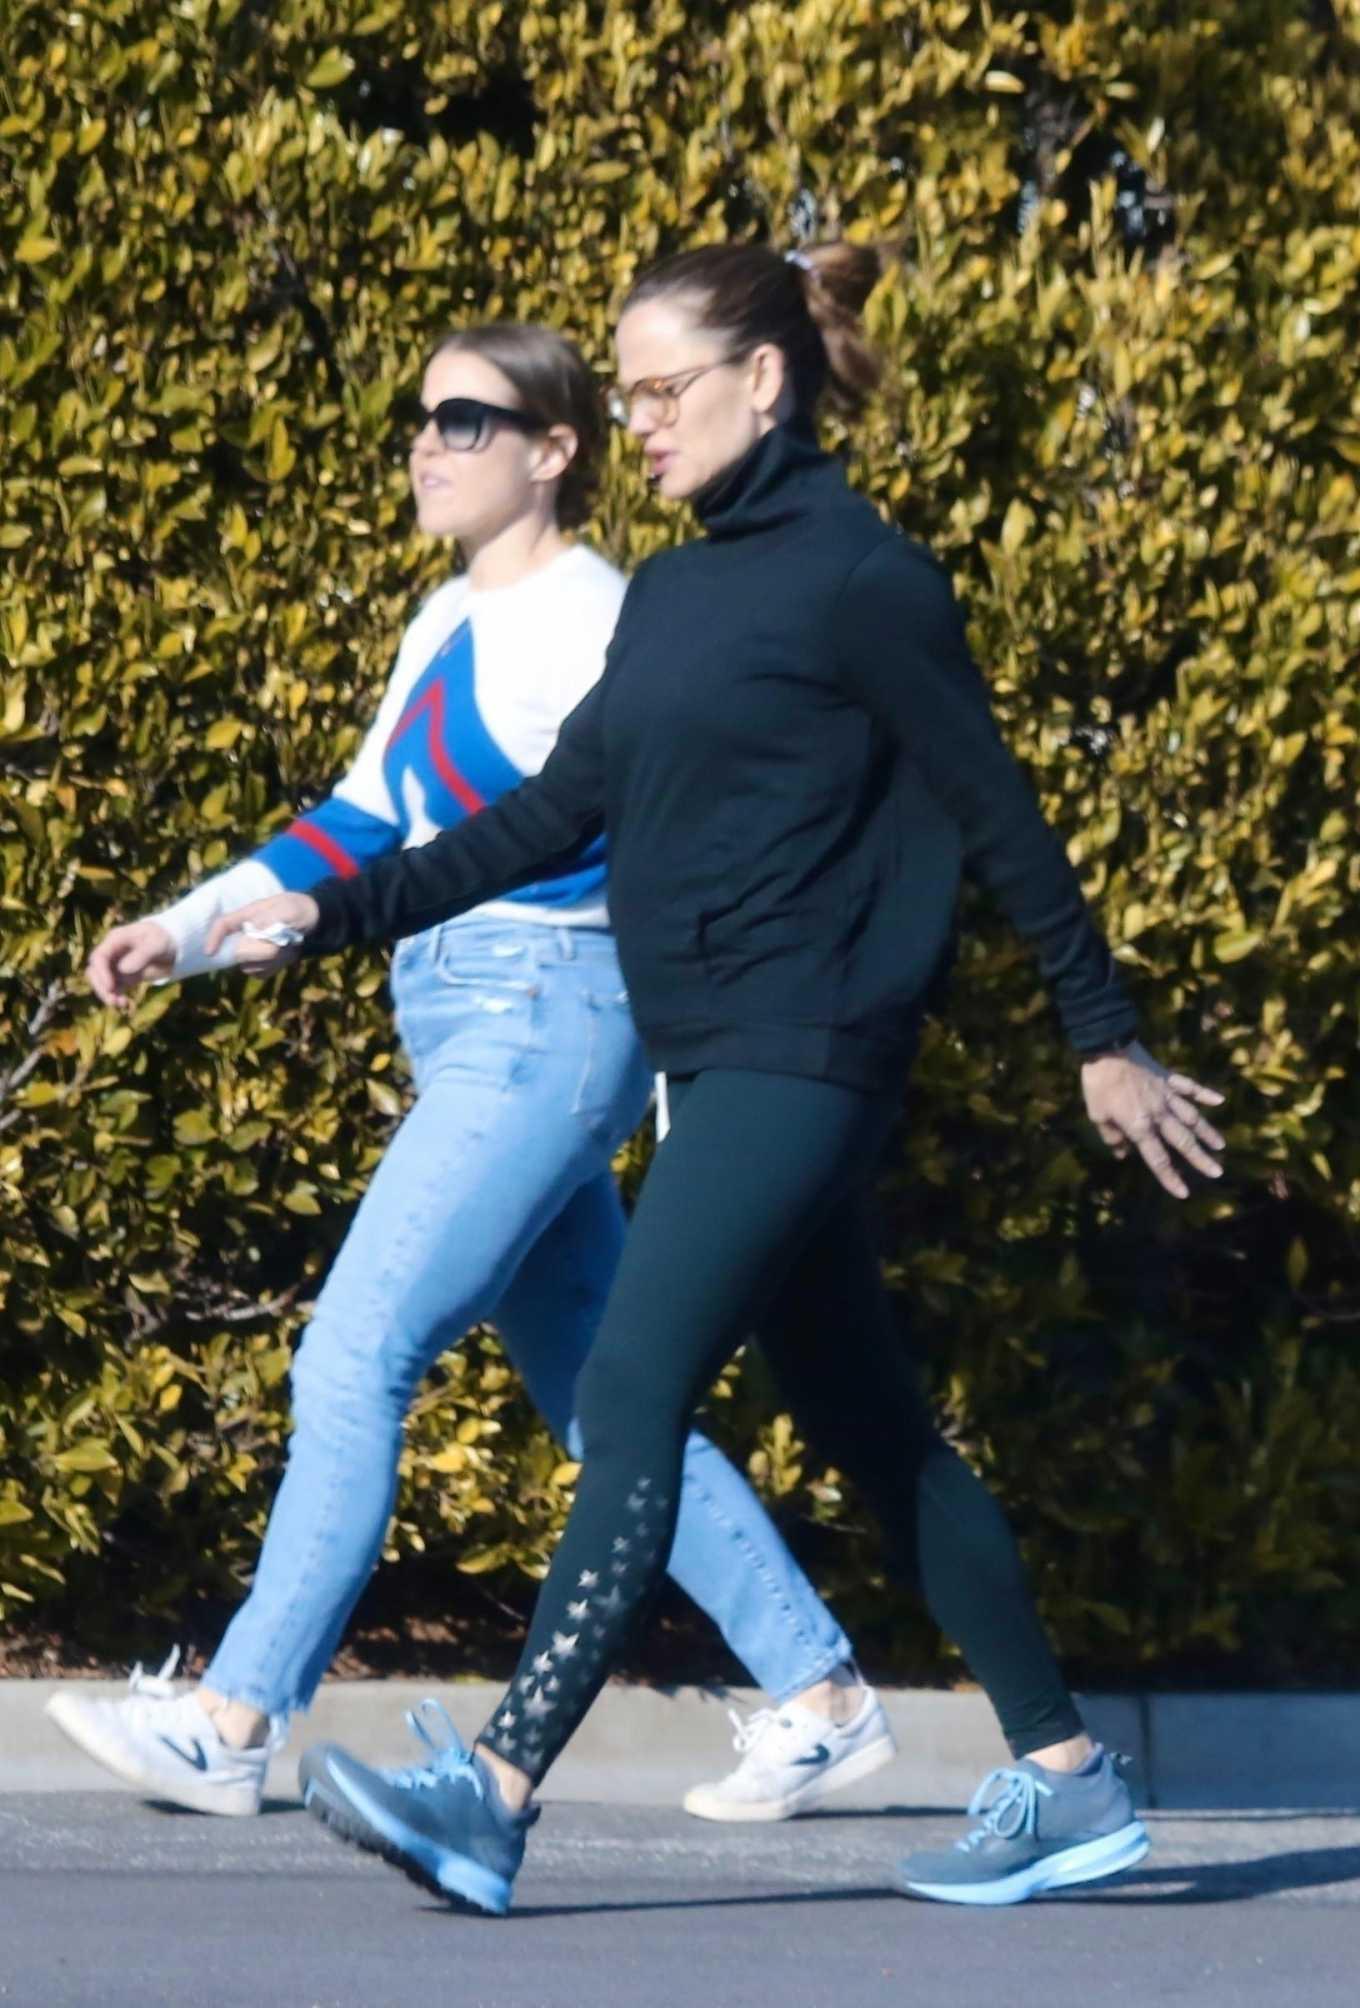 Jennifer Garner 2020 : Jennifer Garner with a friend out for a power walk session in Pacific Palisades-01